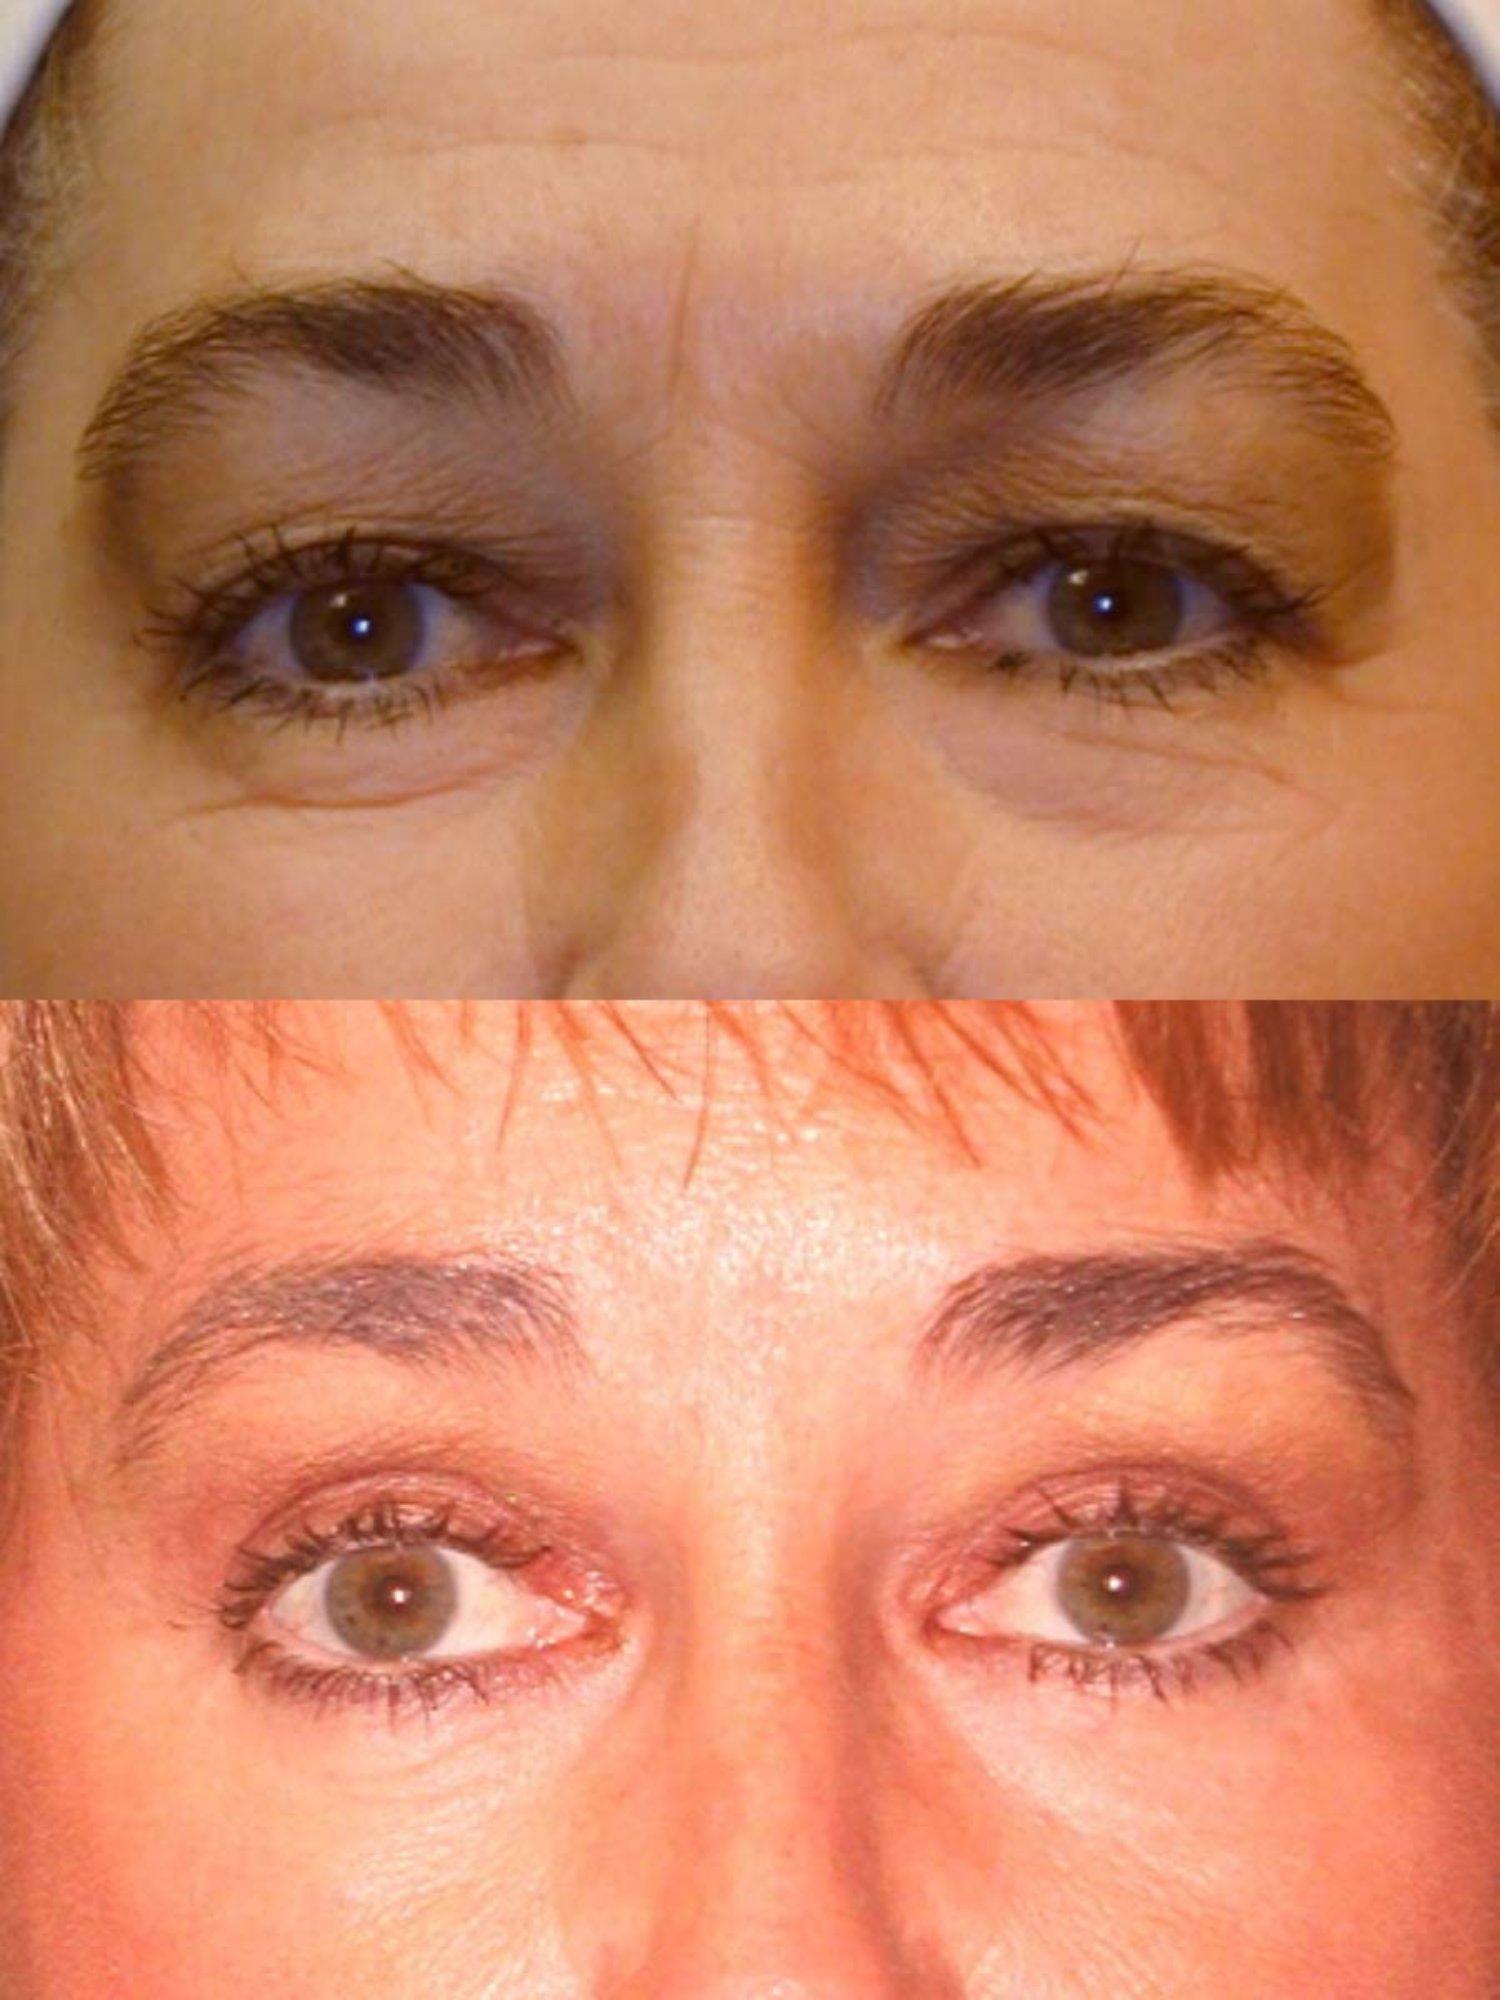 Upper and lower blepharoplasty, brow lift, facelift